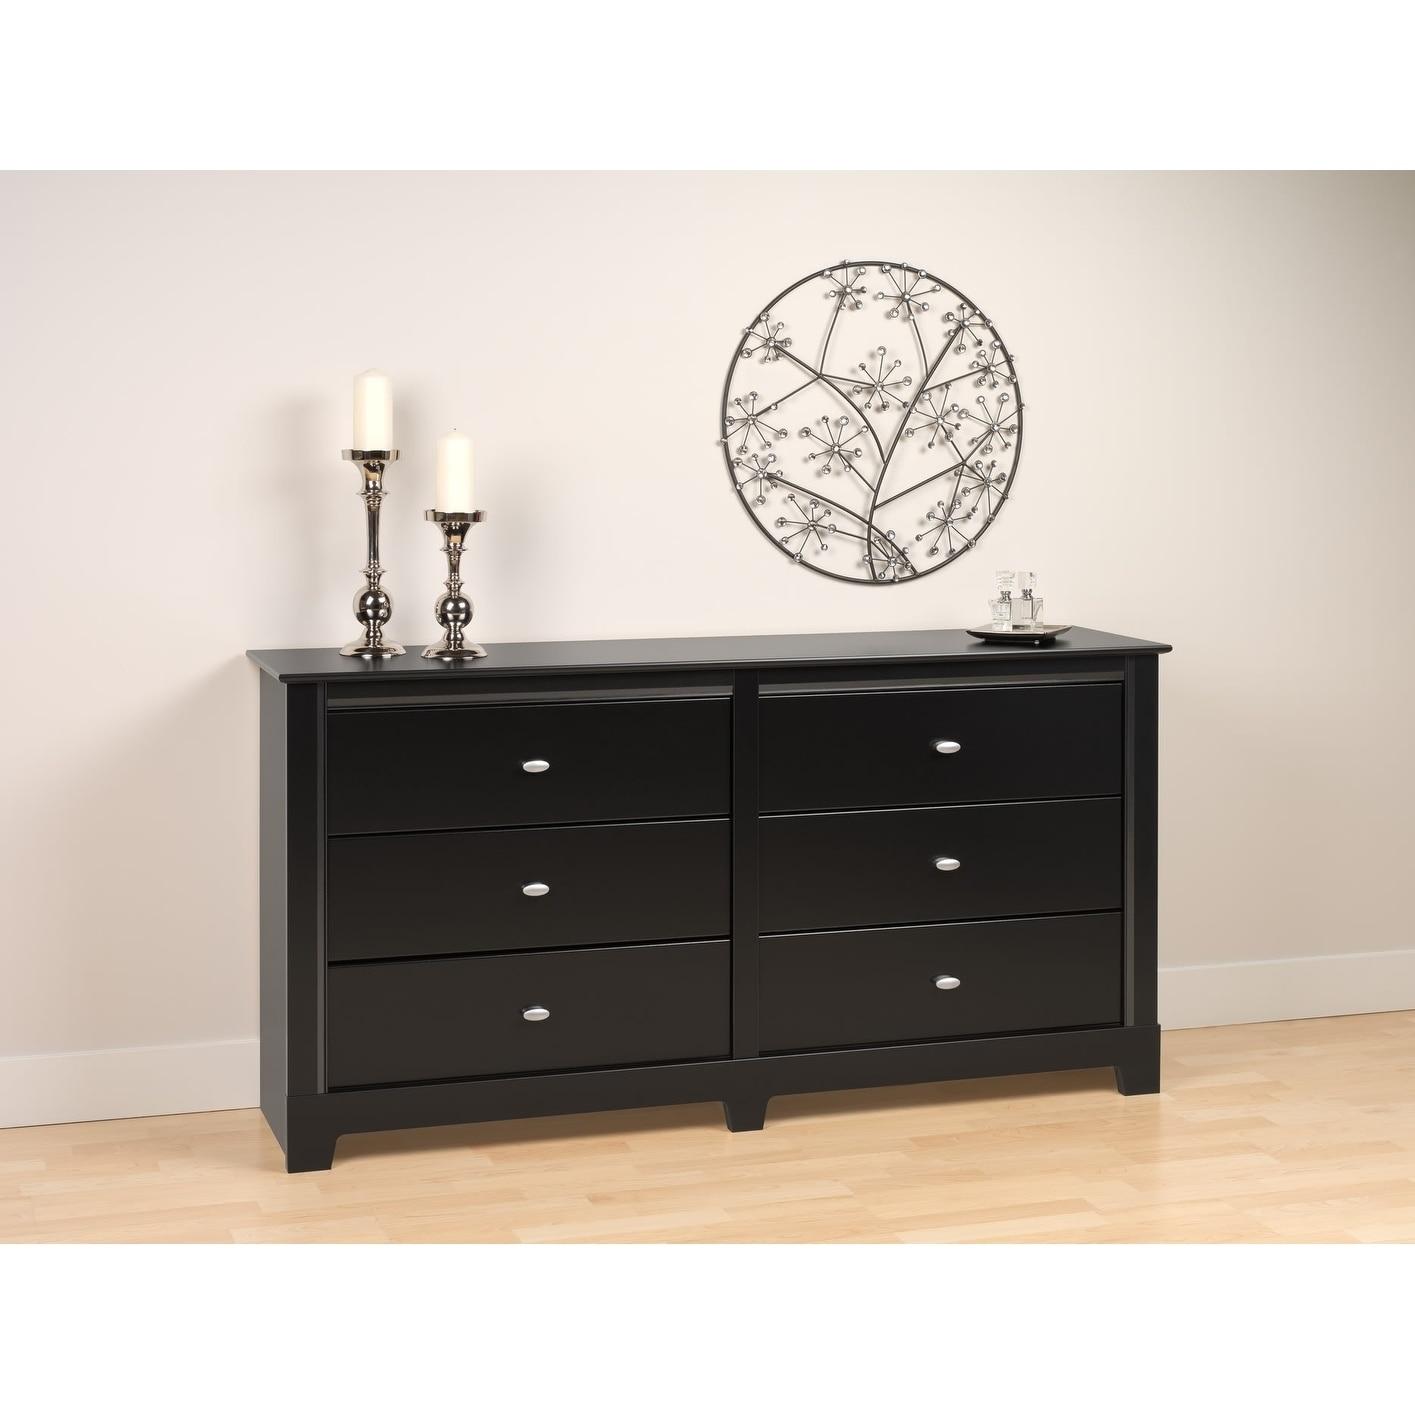 Prepac Nicola Black 6-drawer Dresser